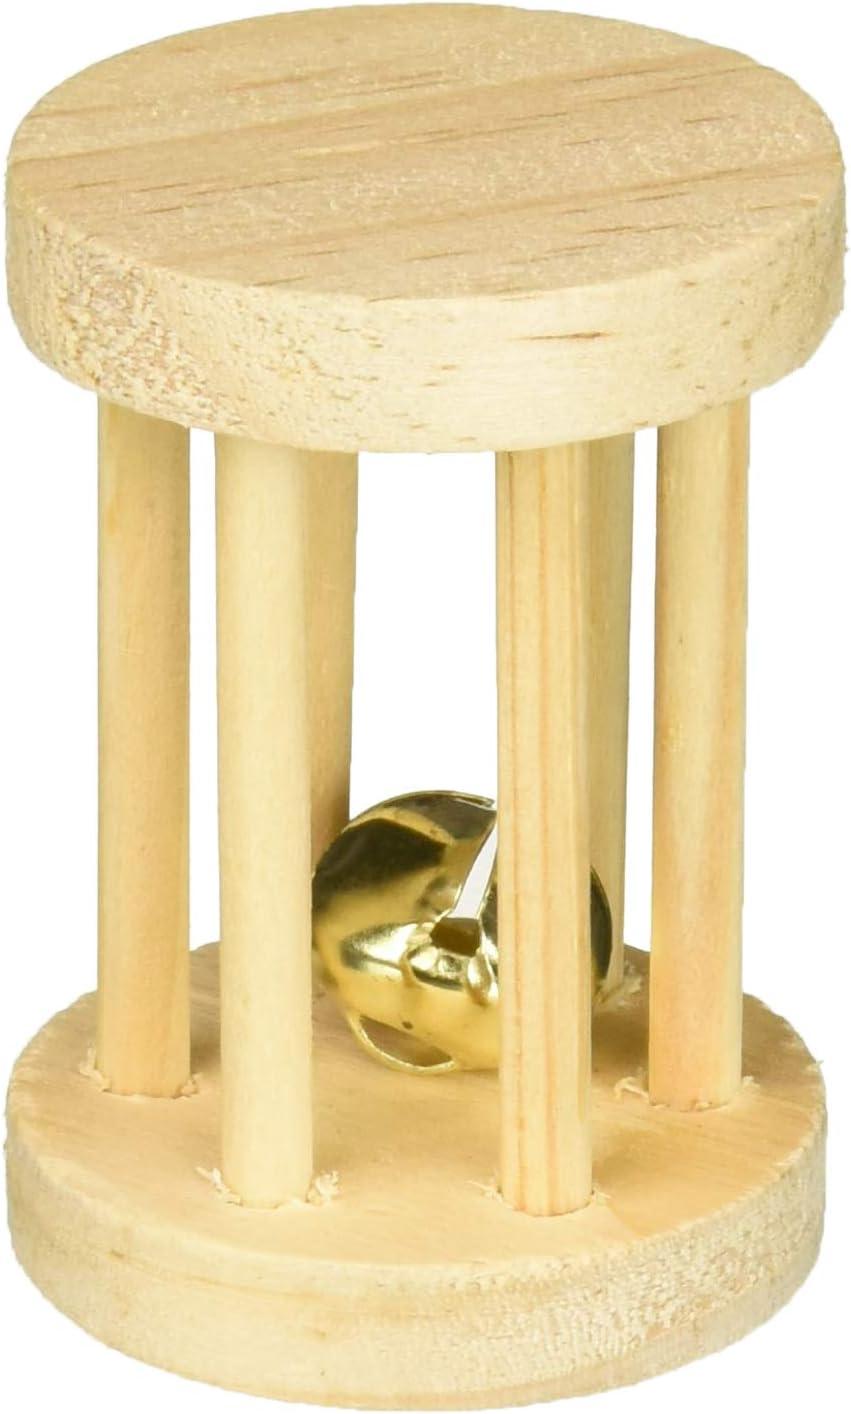 Trixie Cilindro Madera con Cascabel para Roer, ø5x7 cm